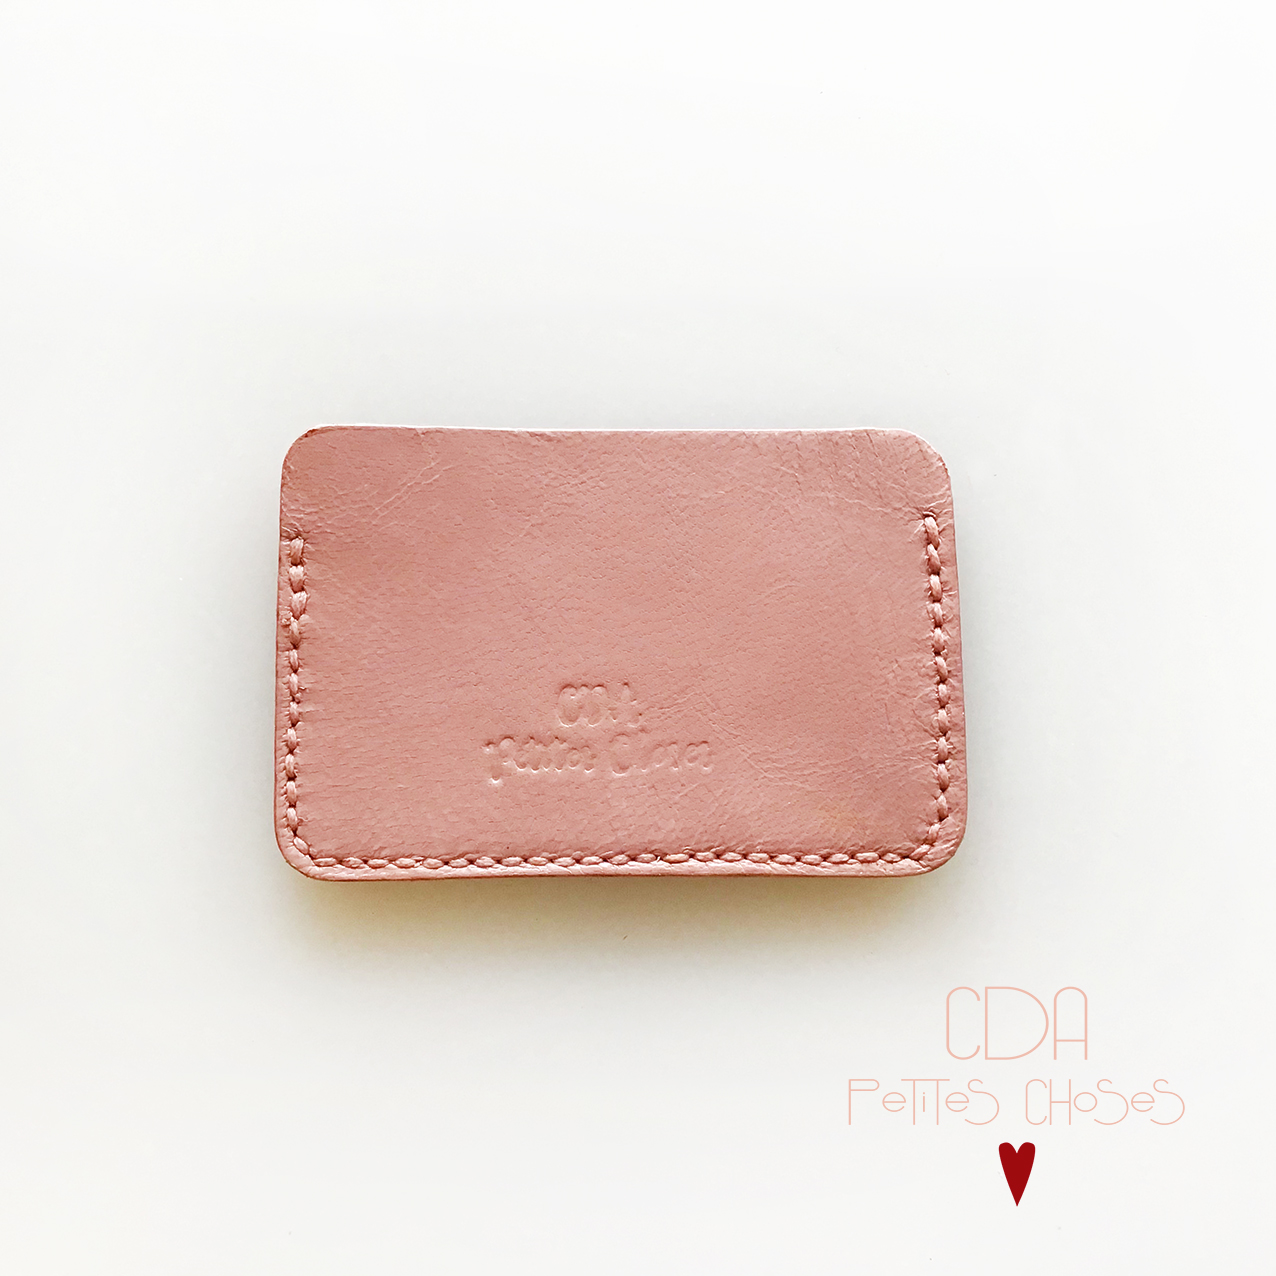 Porte carte en cuir vieux rose CDA Petites Choses